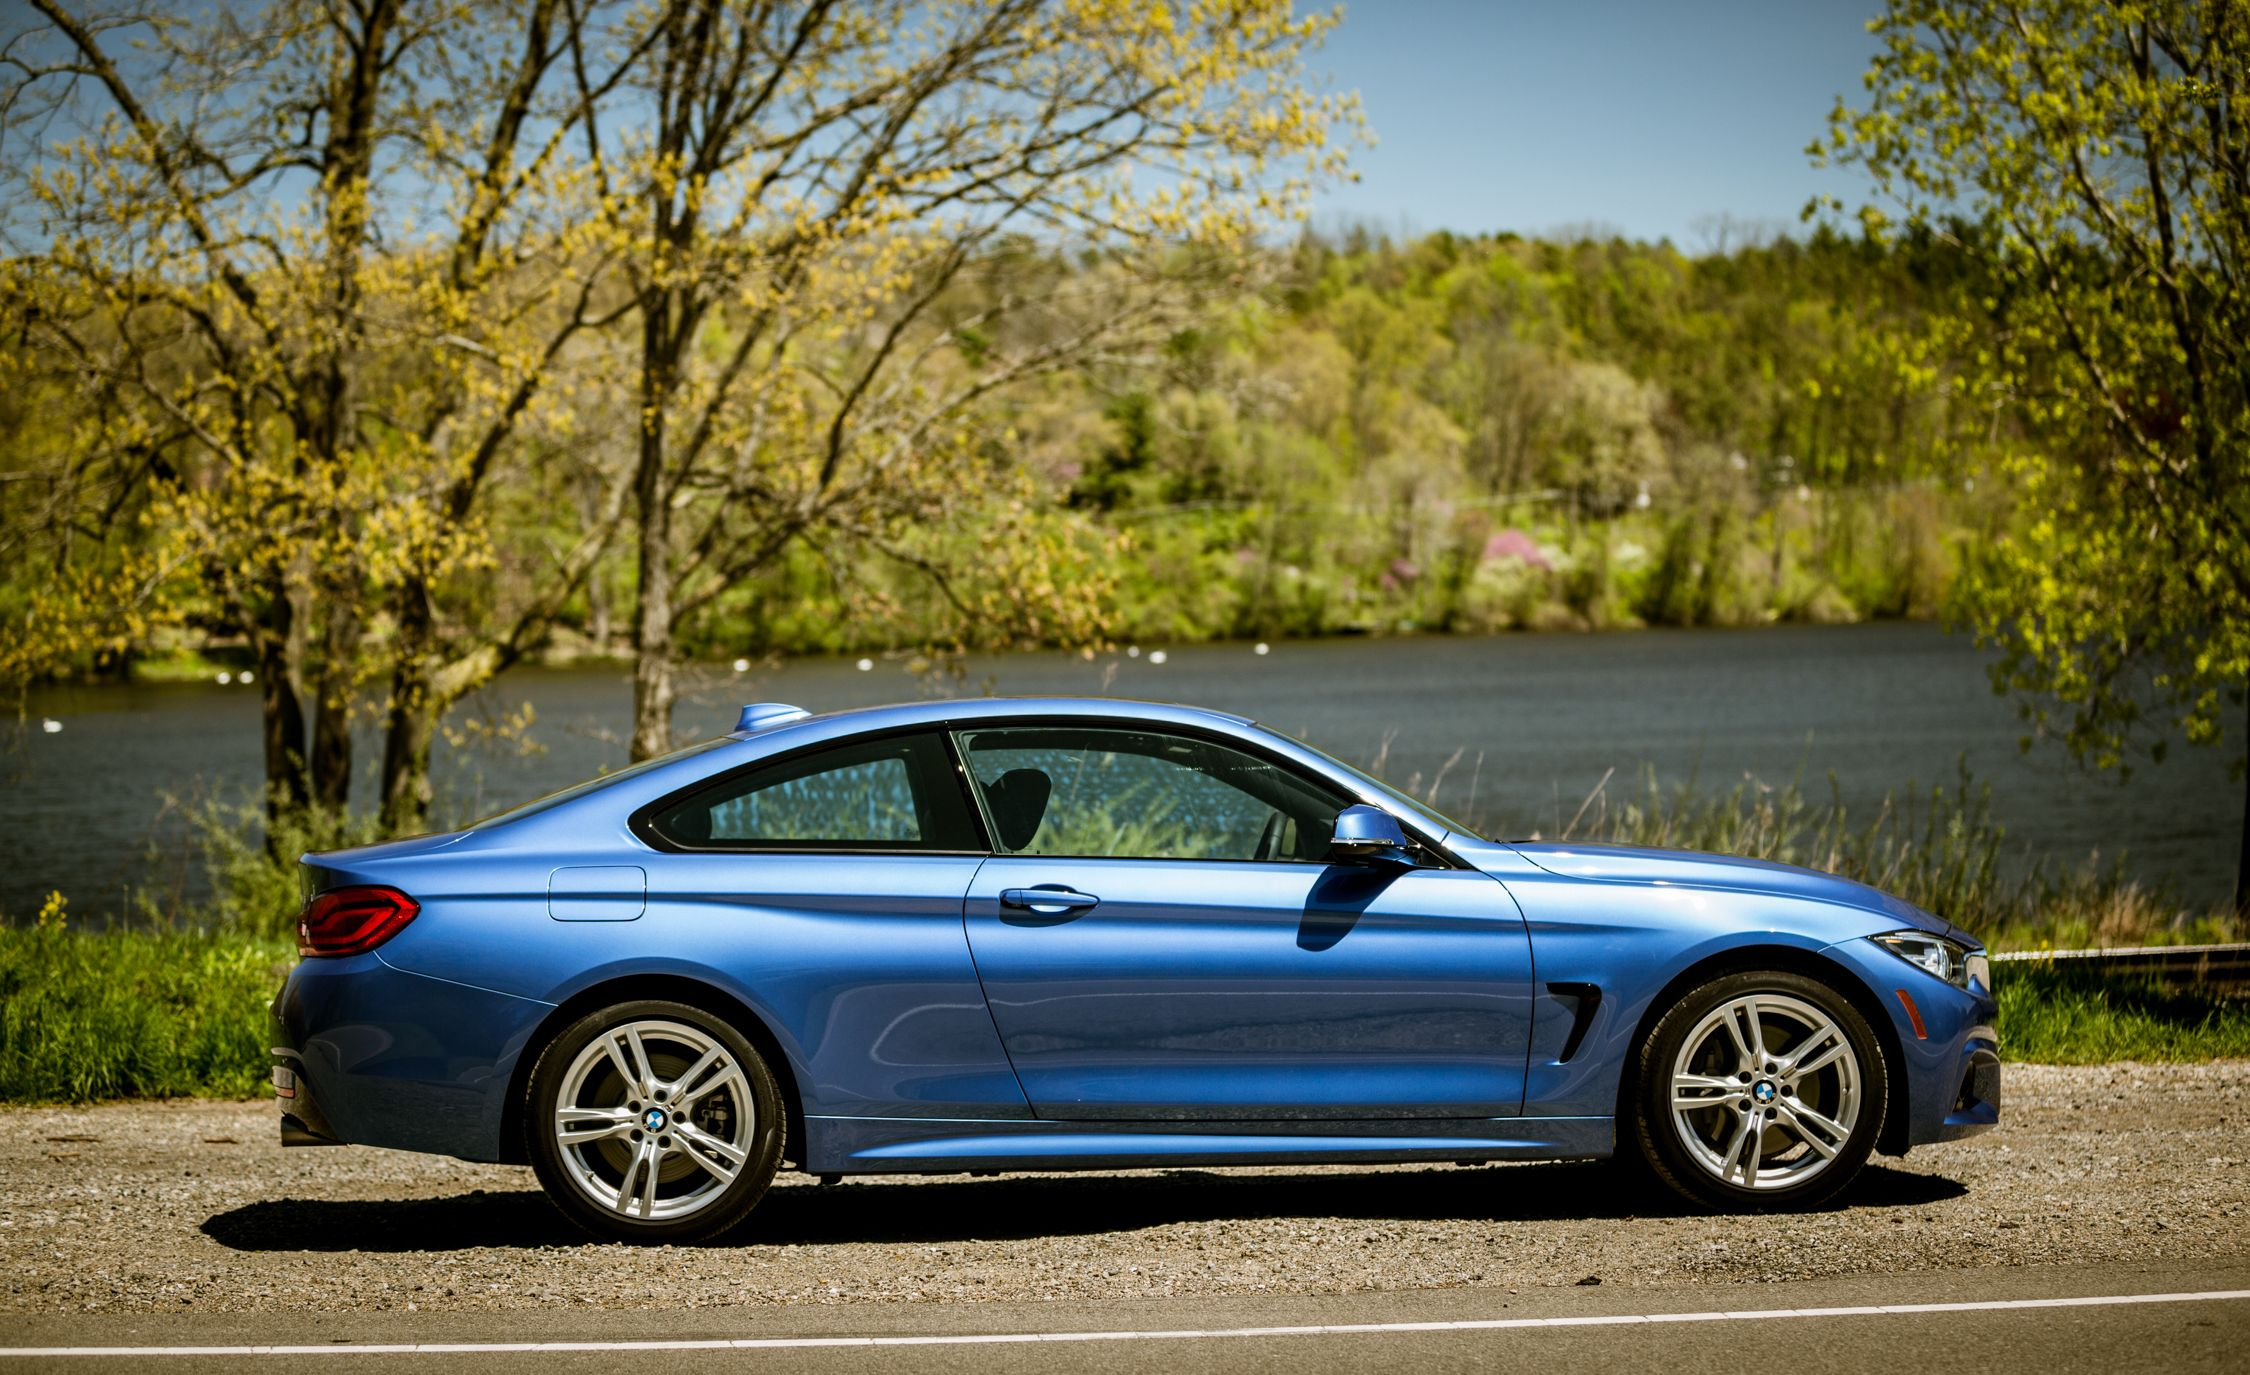 BMW Series Reviews BMW Series Price Photos And Specs Car - 435xi bmw